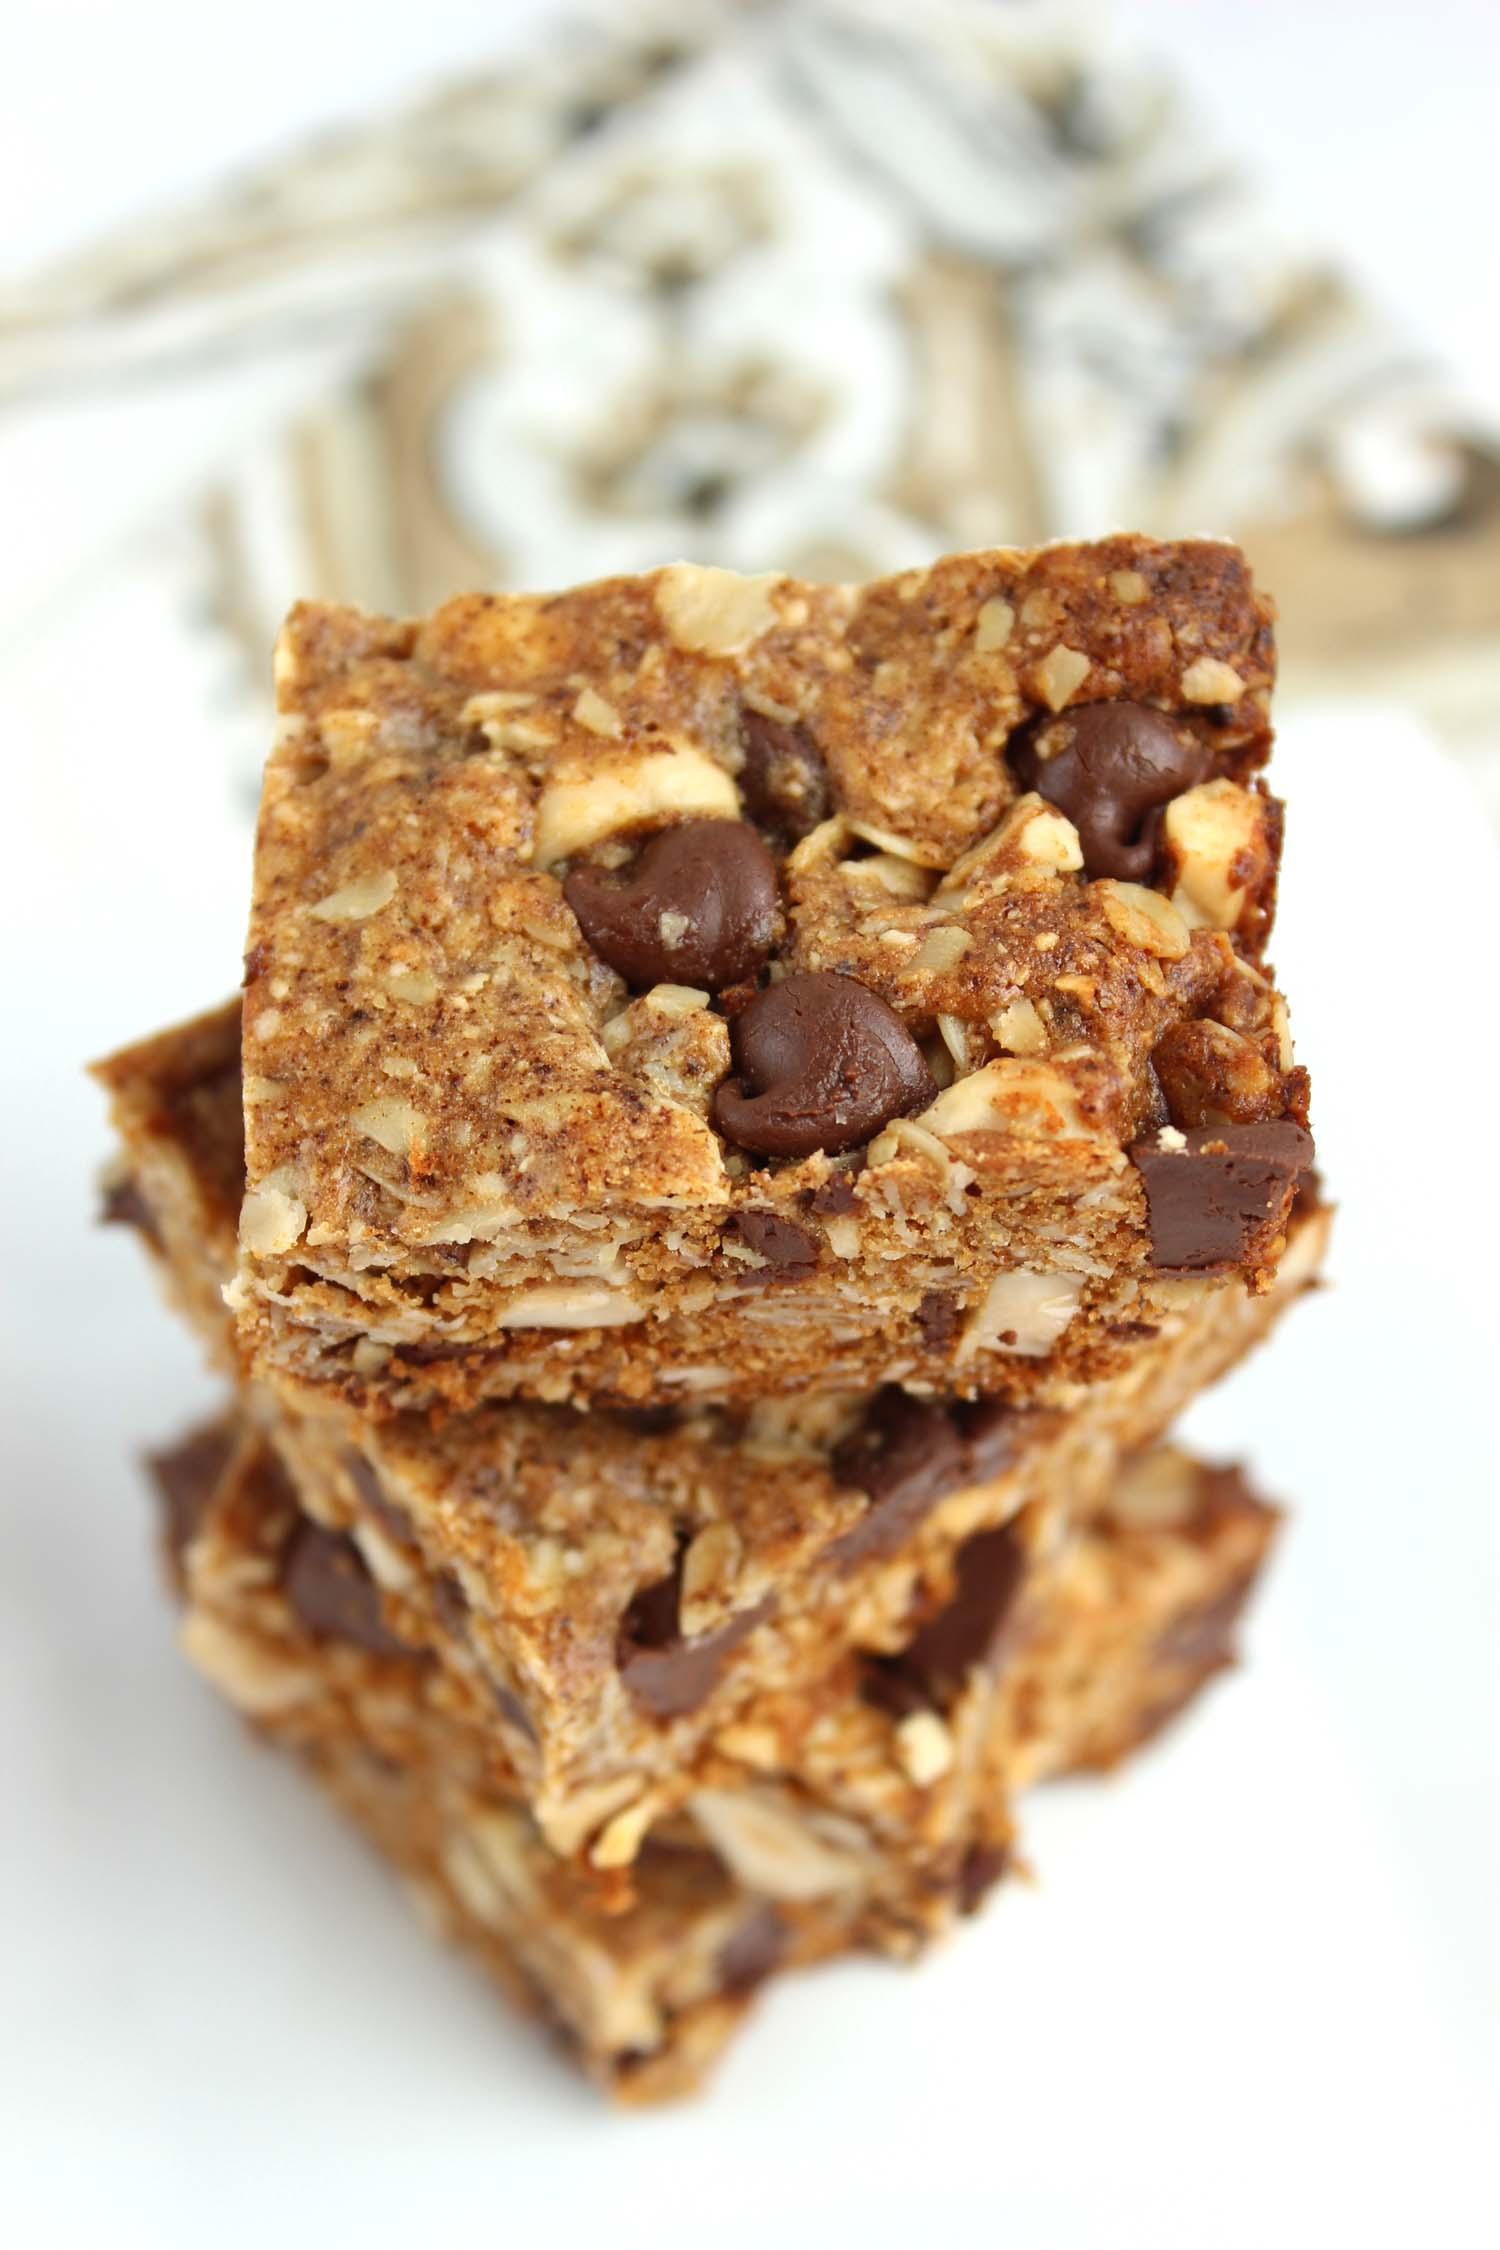 Mocha Hazelnut Granola Bars  | Image:  Laura Messersmith